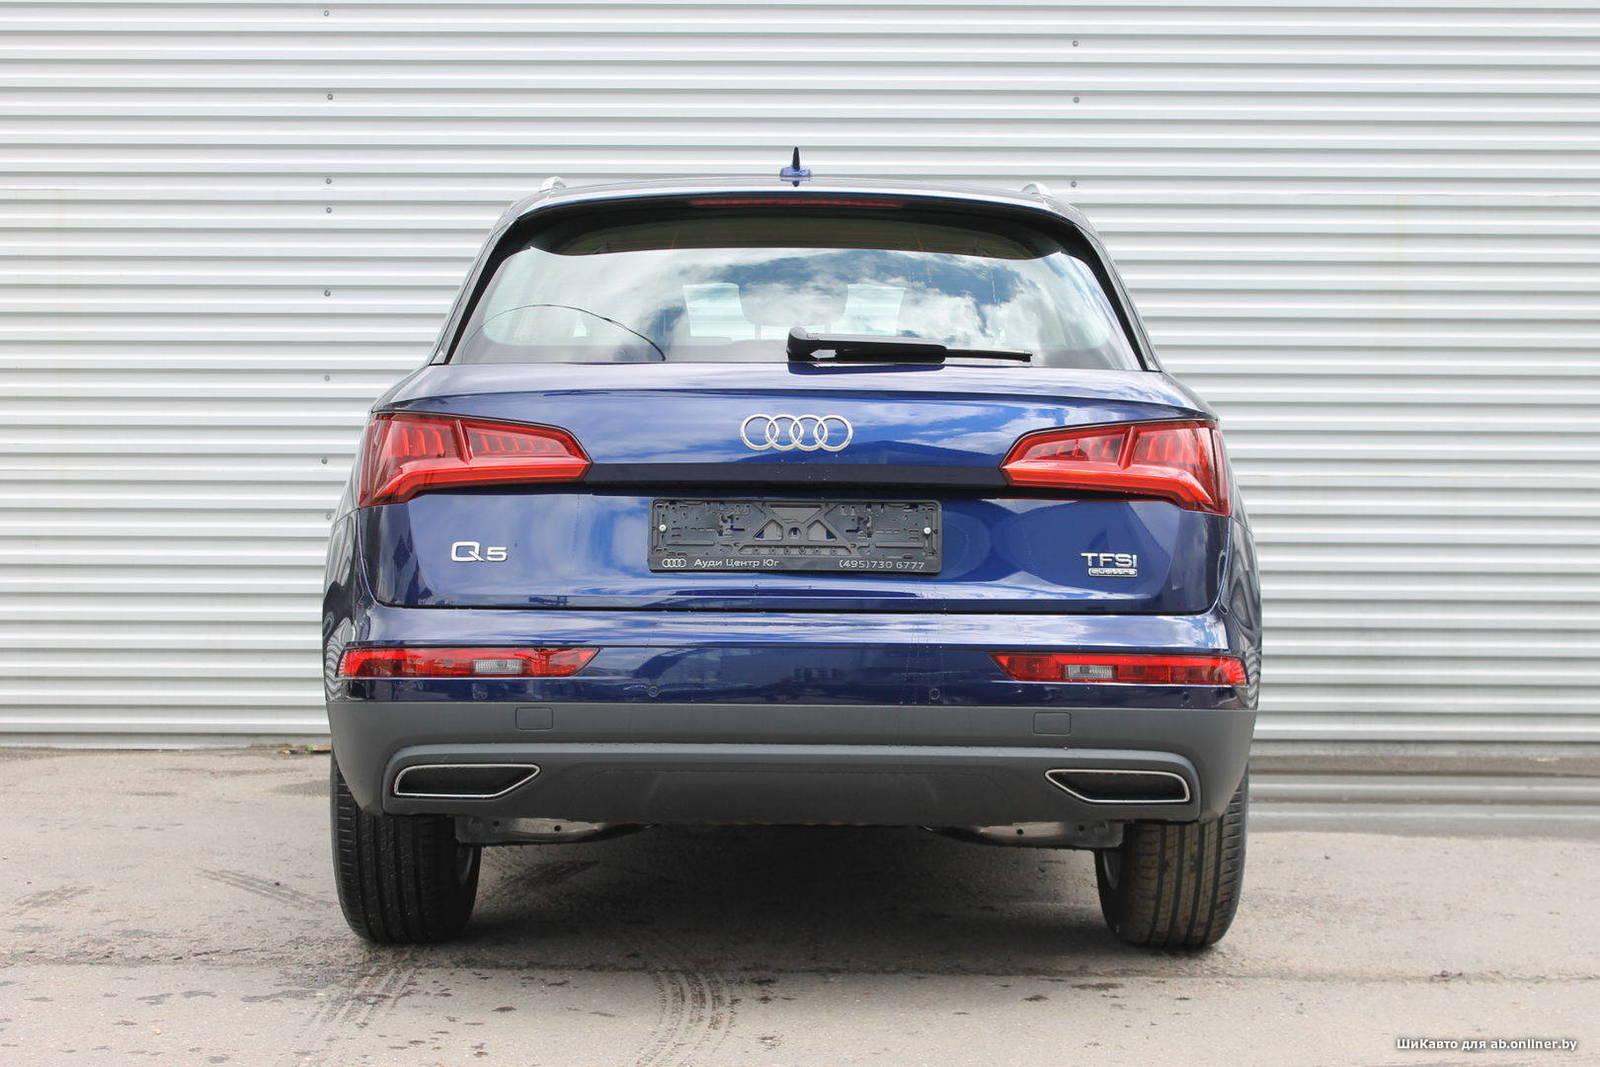 Audi Q5 2.0 TFSI Sport quattro S troni